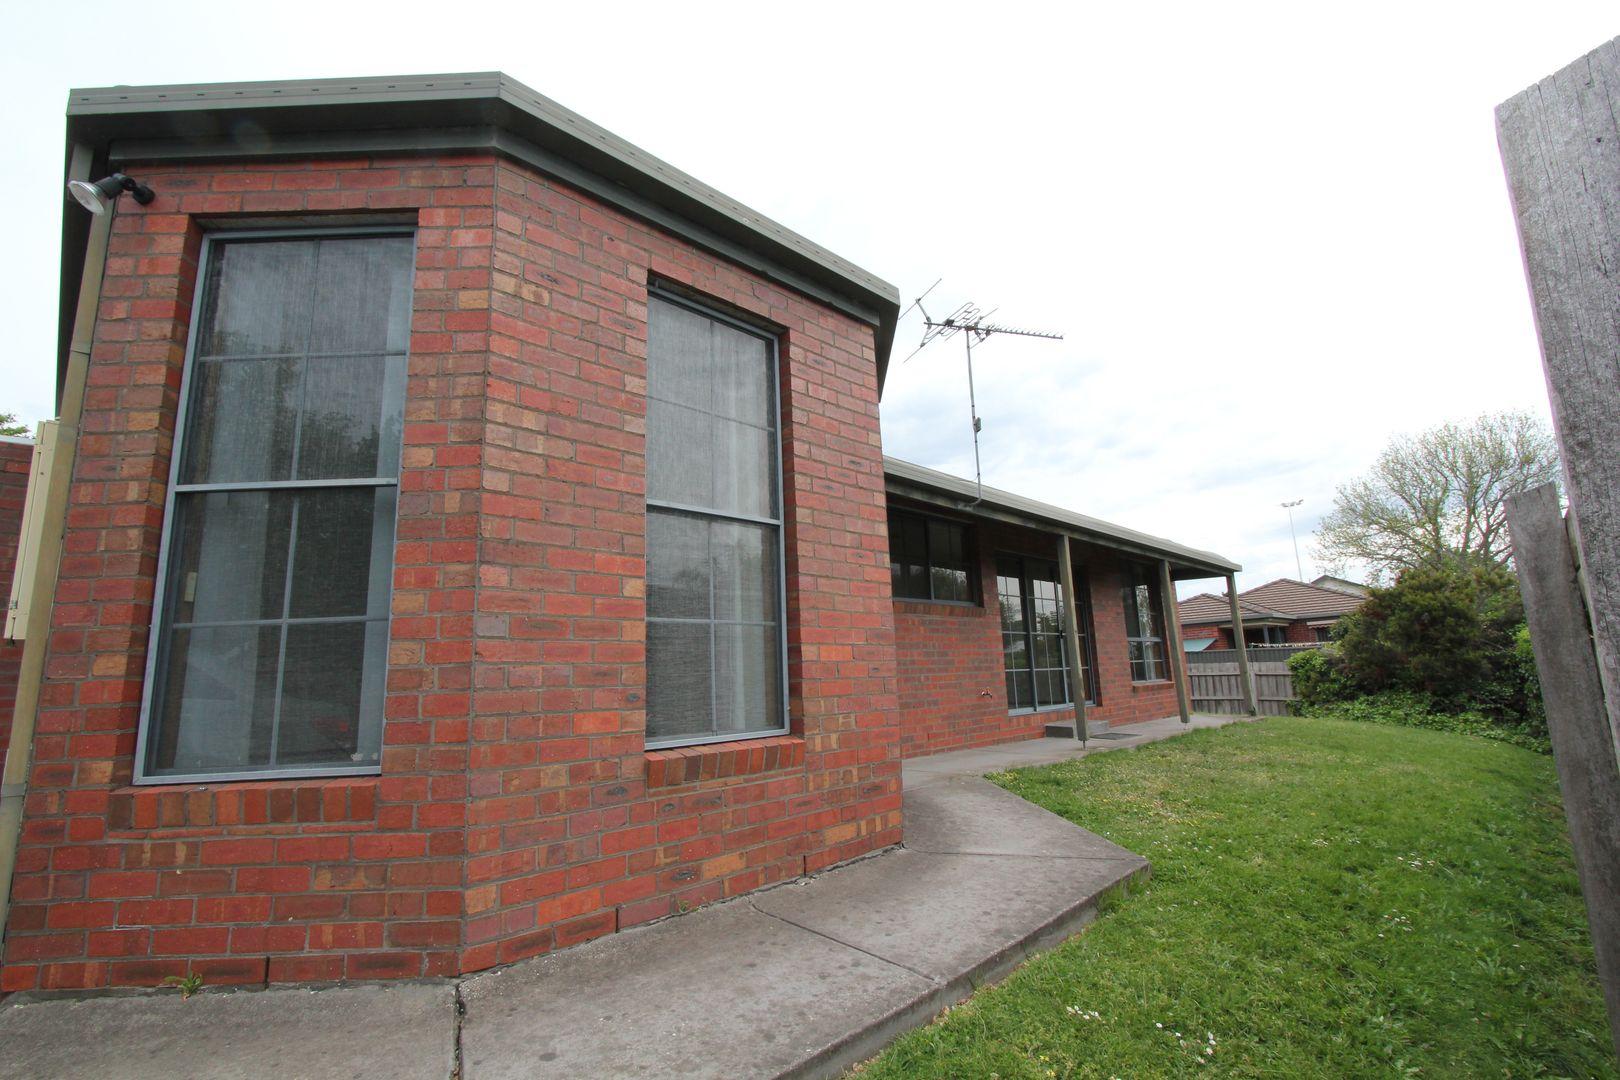 2/206 Talbot Street South, Ballarat Central VIC 3350, Image 0